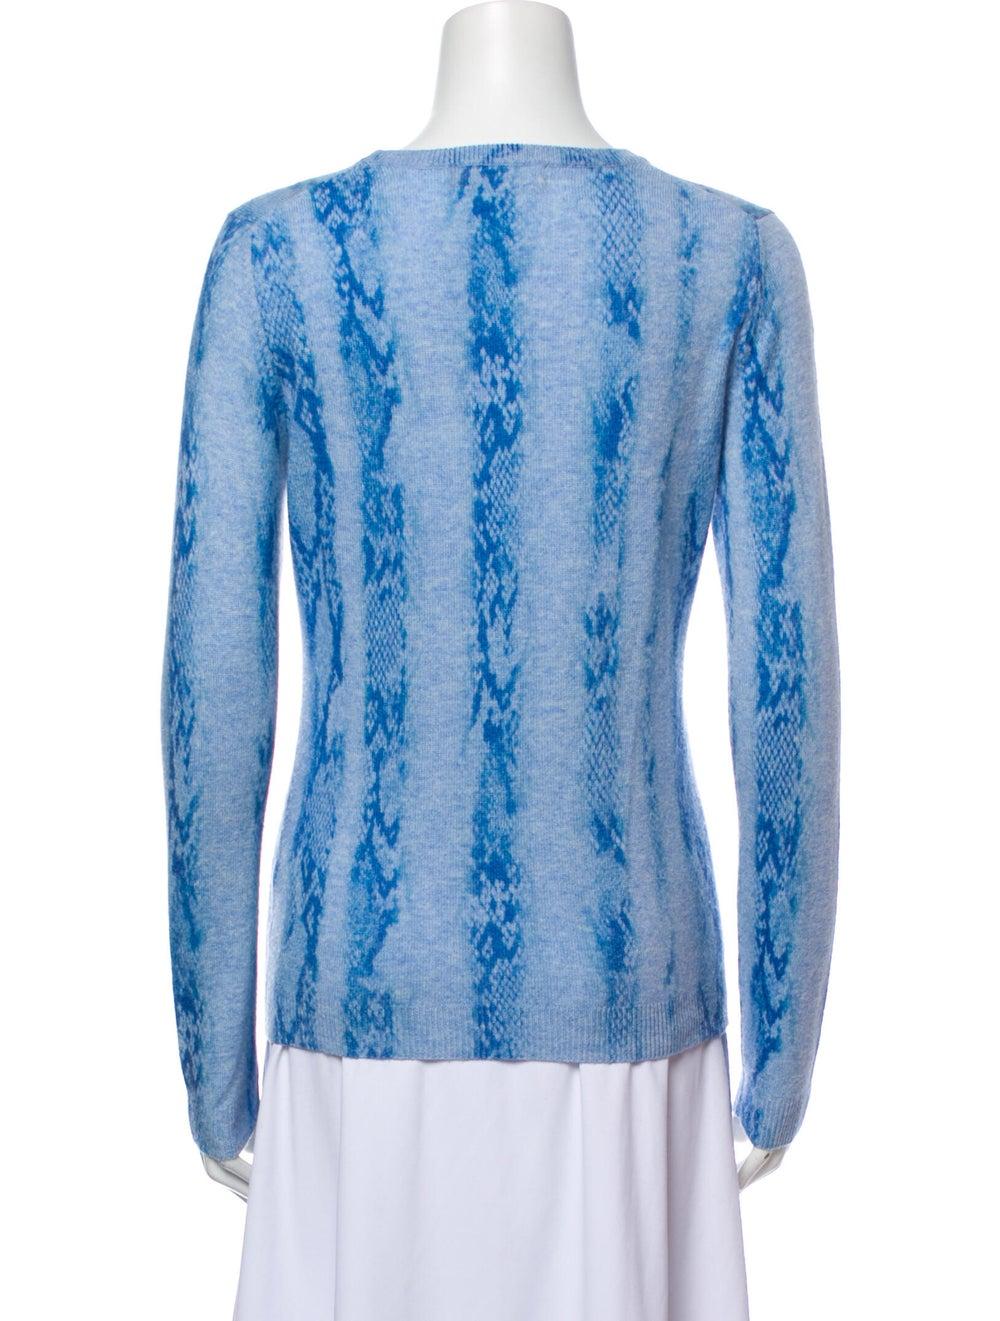 Brodie Cashmere Tie-Dye Print Sweater Blue - image 3